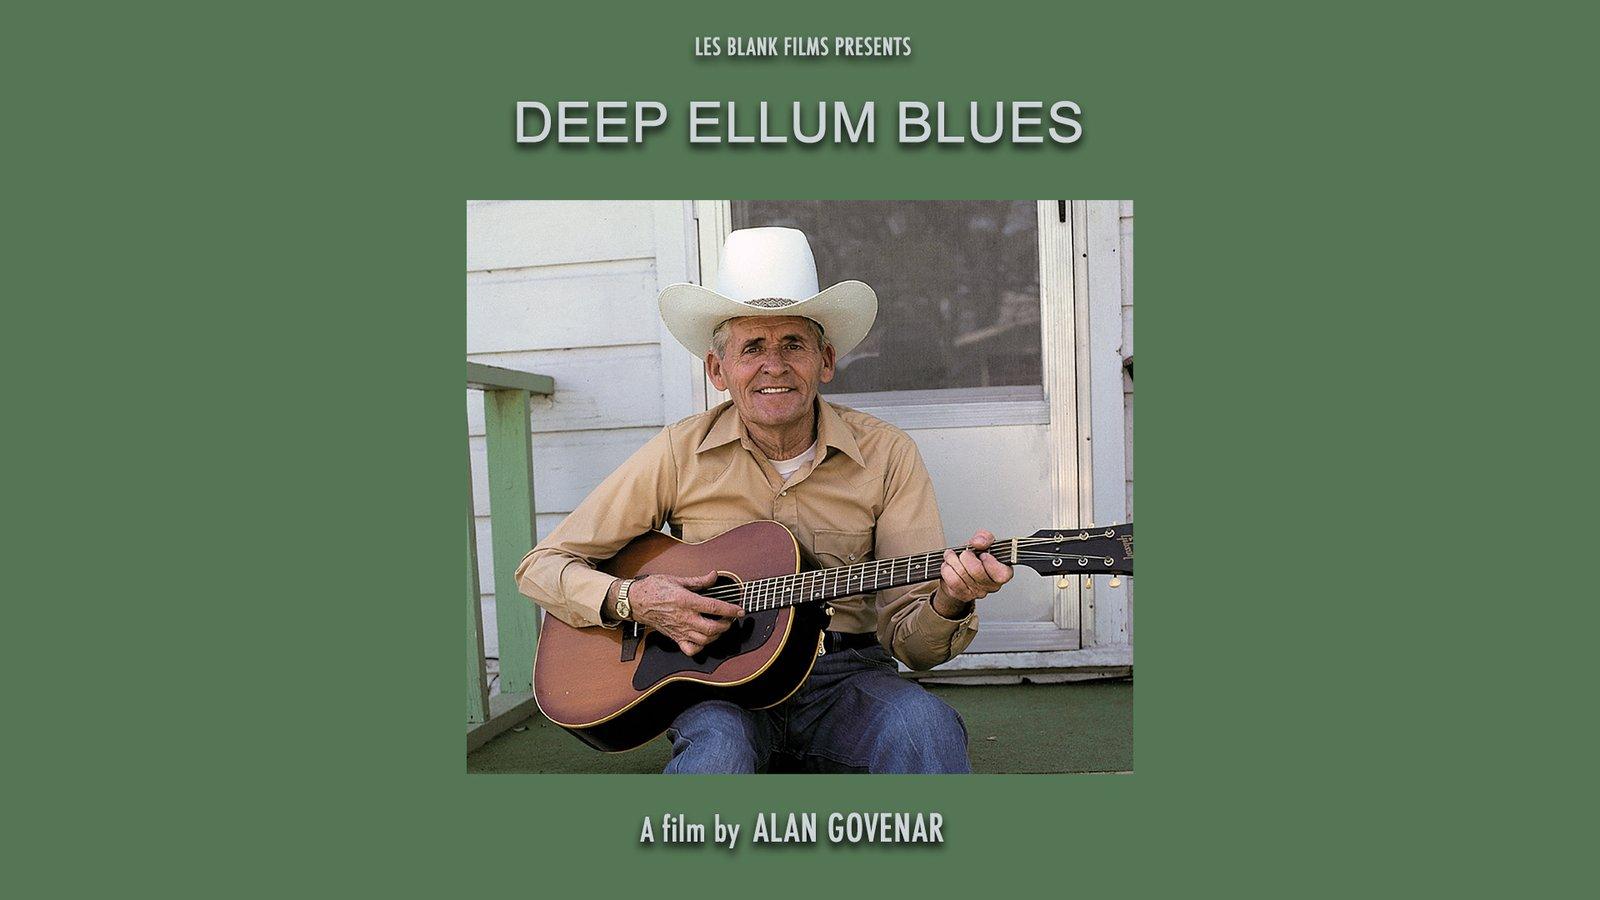 Deep Ellum Blues